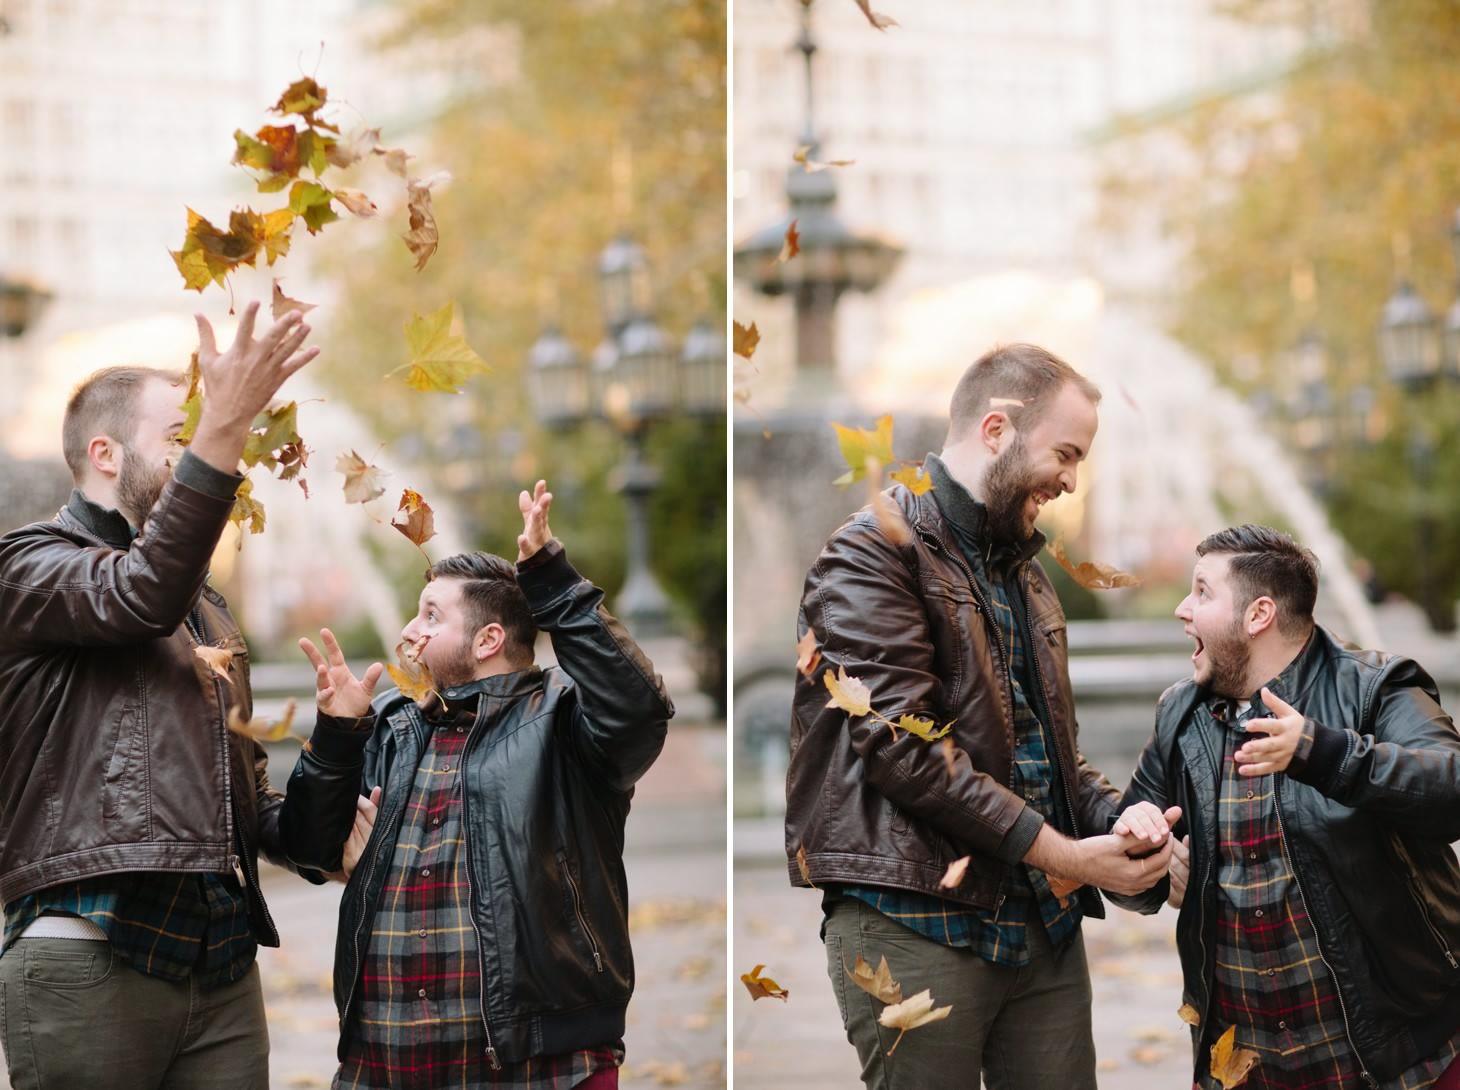 007-nyc-wedding-elopement-lgbt-friendly-photographer-city-hall-kareoke.jpg